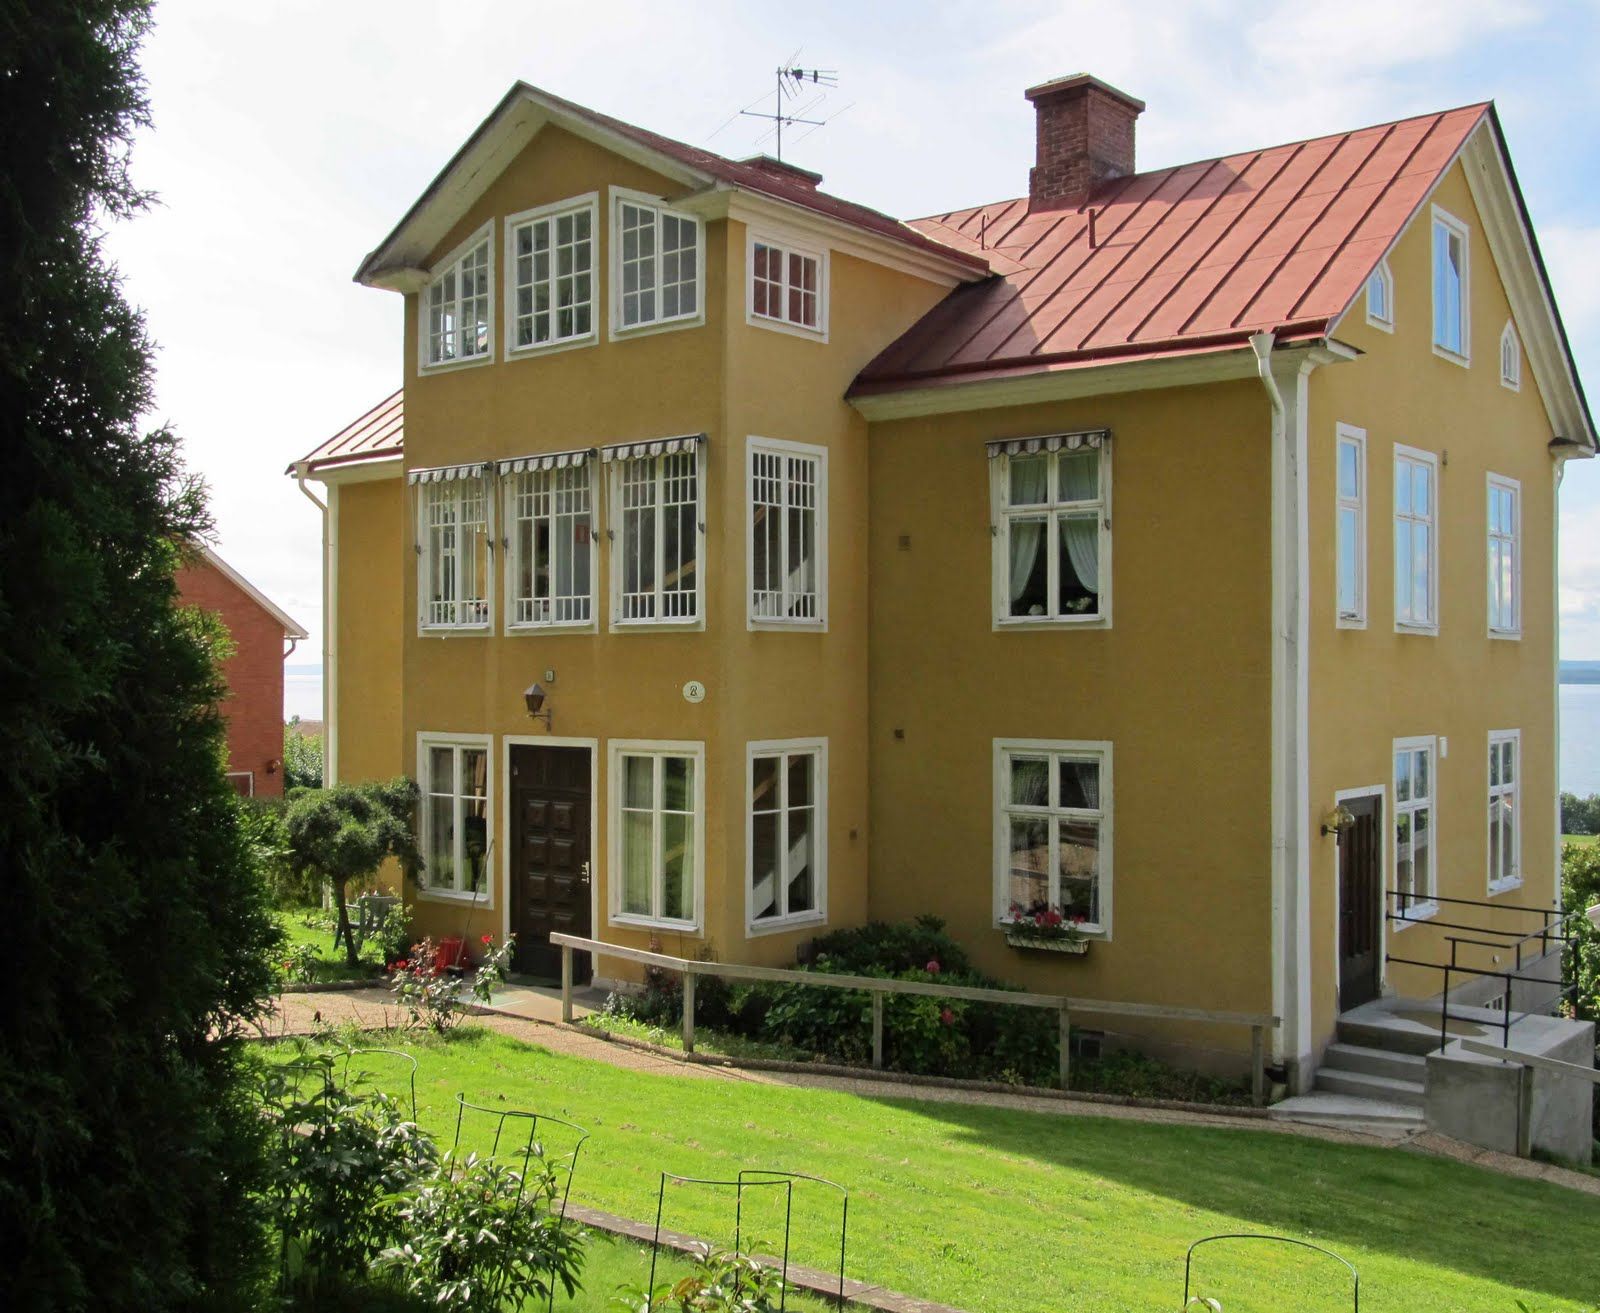 summit musings gaily painted houses polkagris in sweden